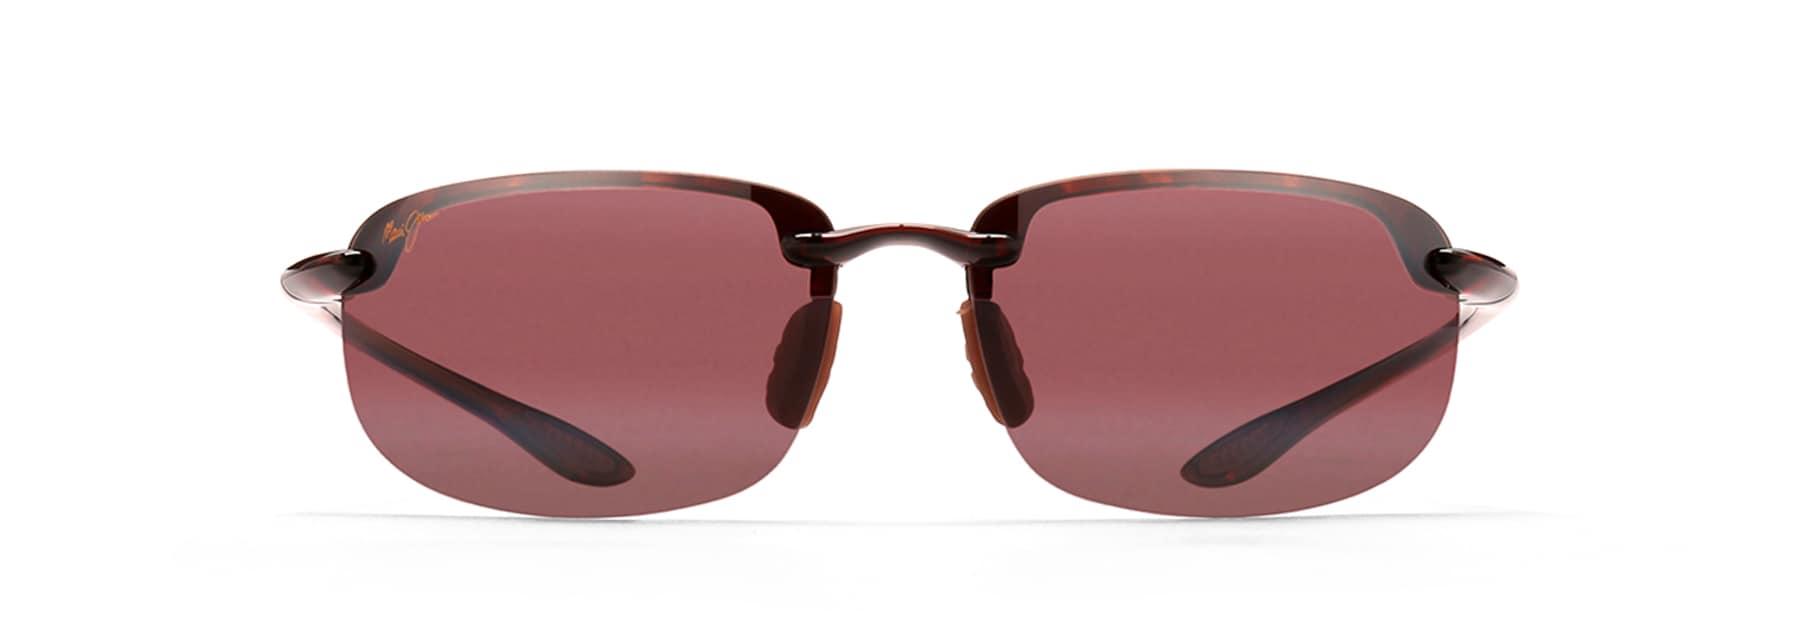 1dee4e91d0b Ho okipa Polarized Sunglasses